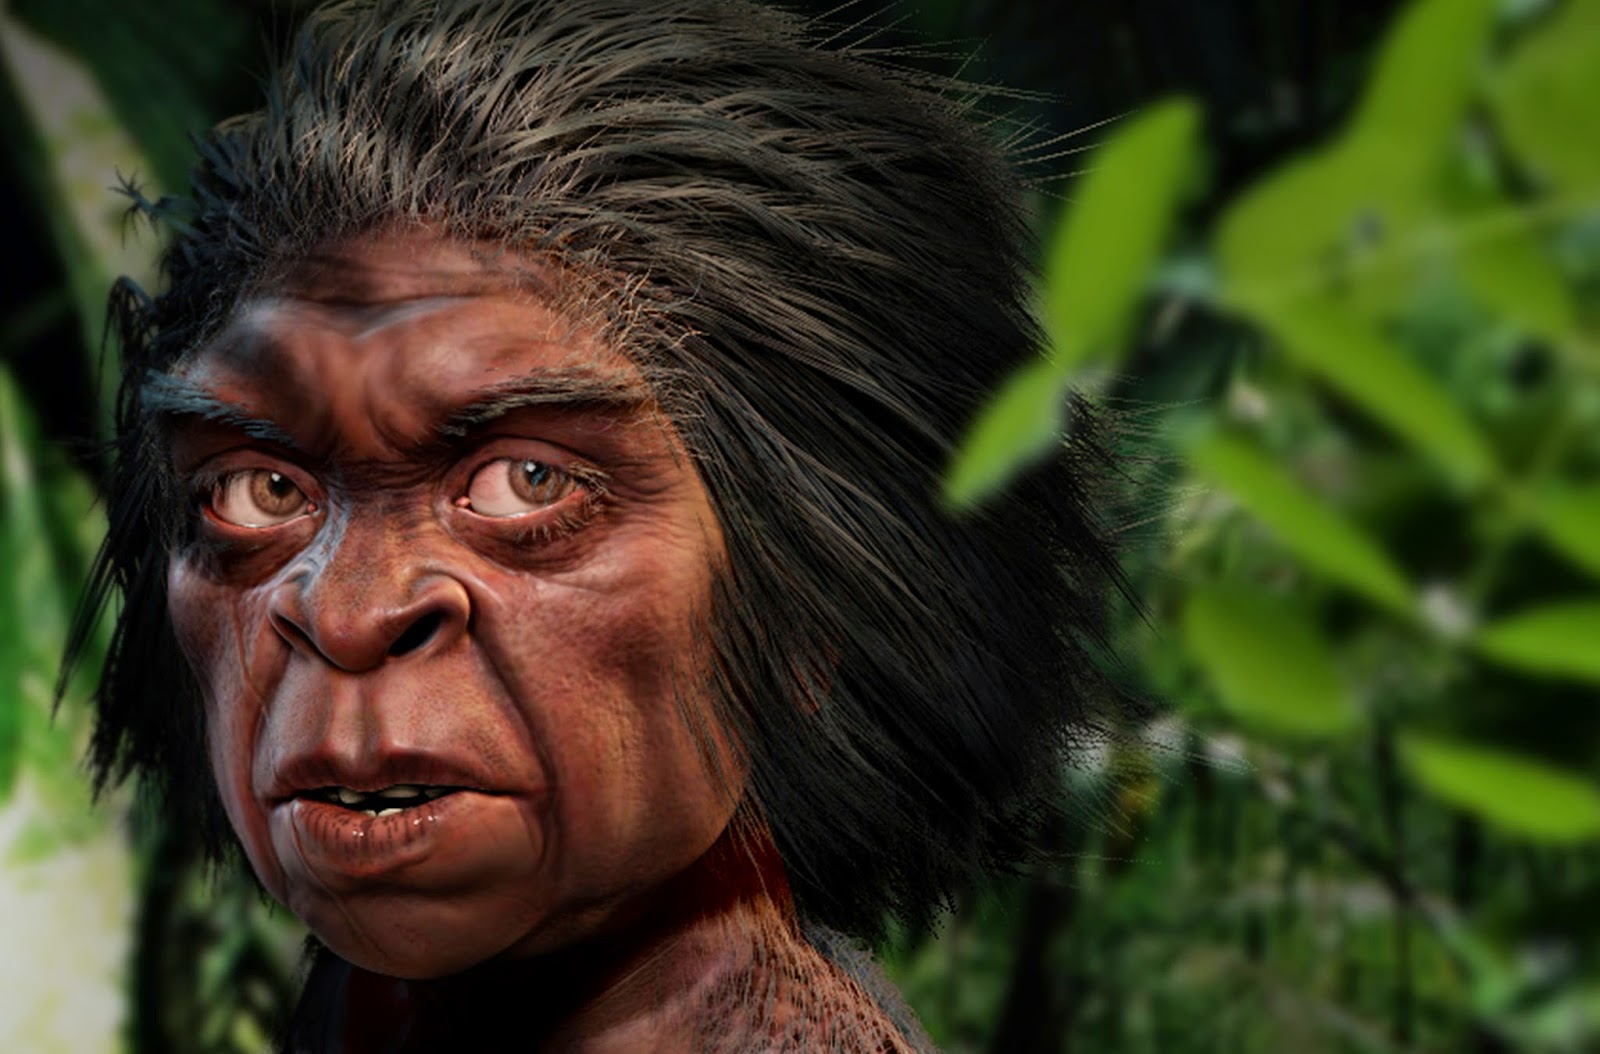 Mengenal Manusia Kerdil 'Hobbit' Nyata di Dunia yang Berasal dari Indonesia